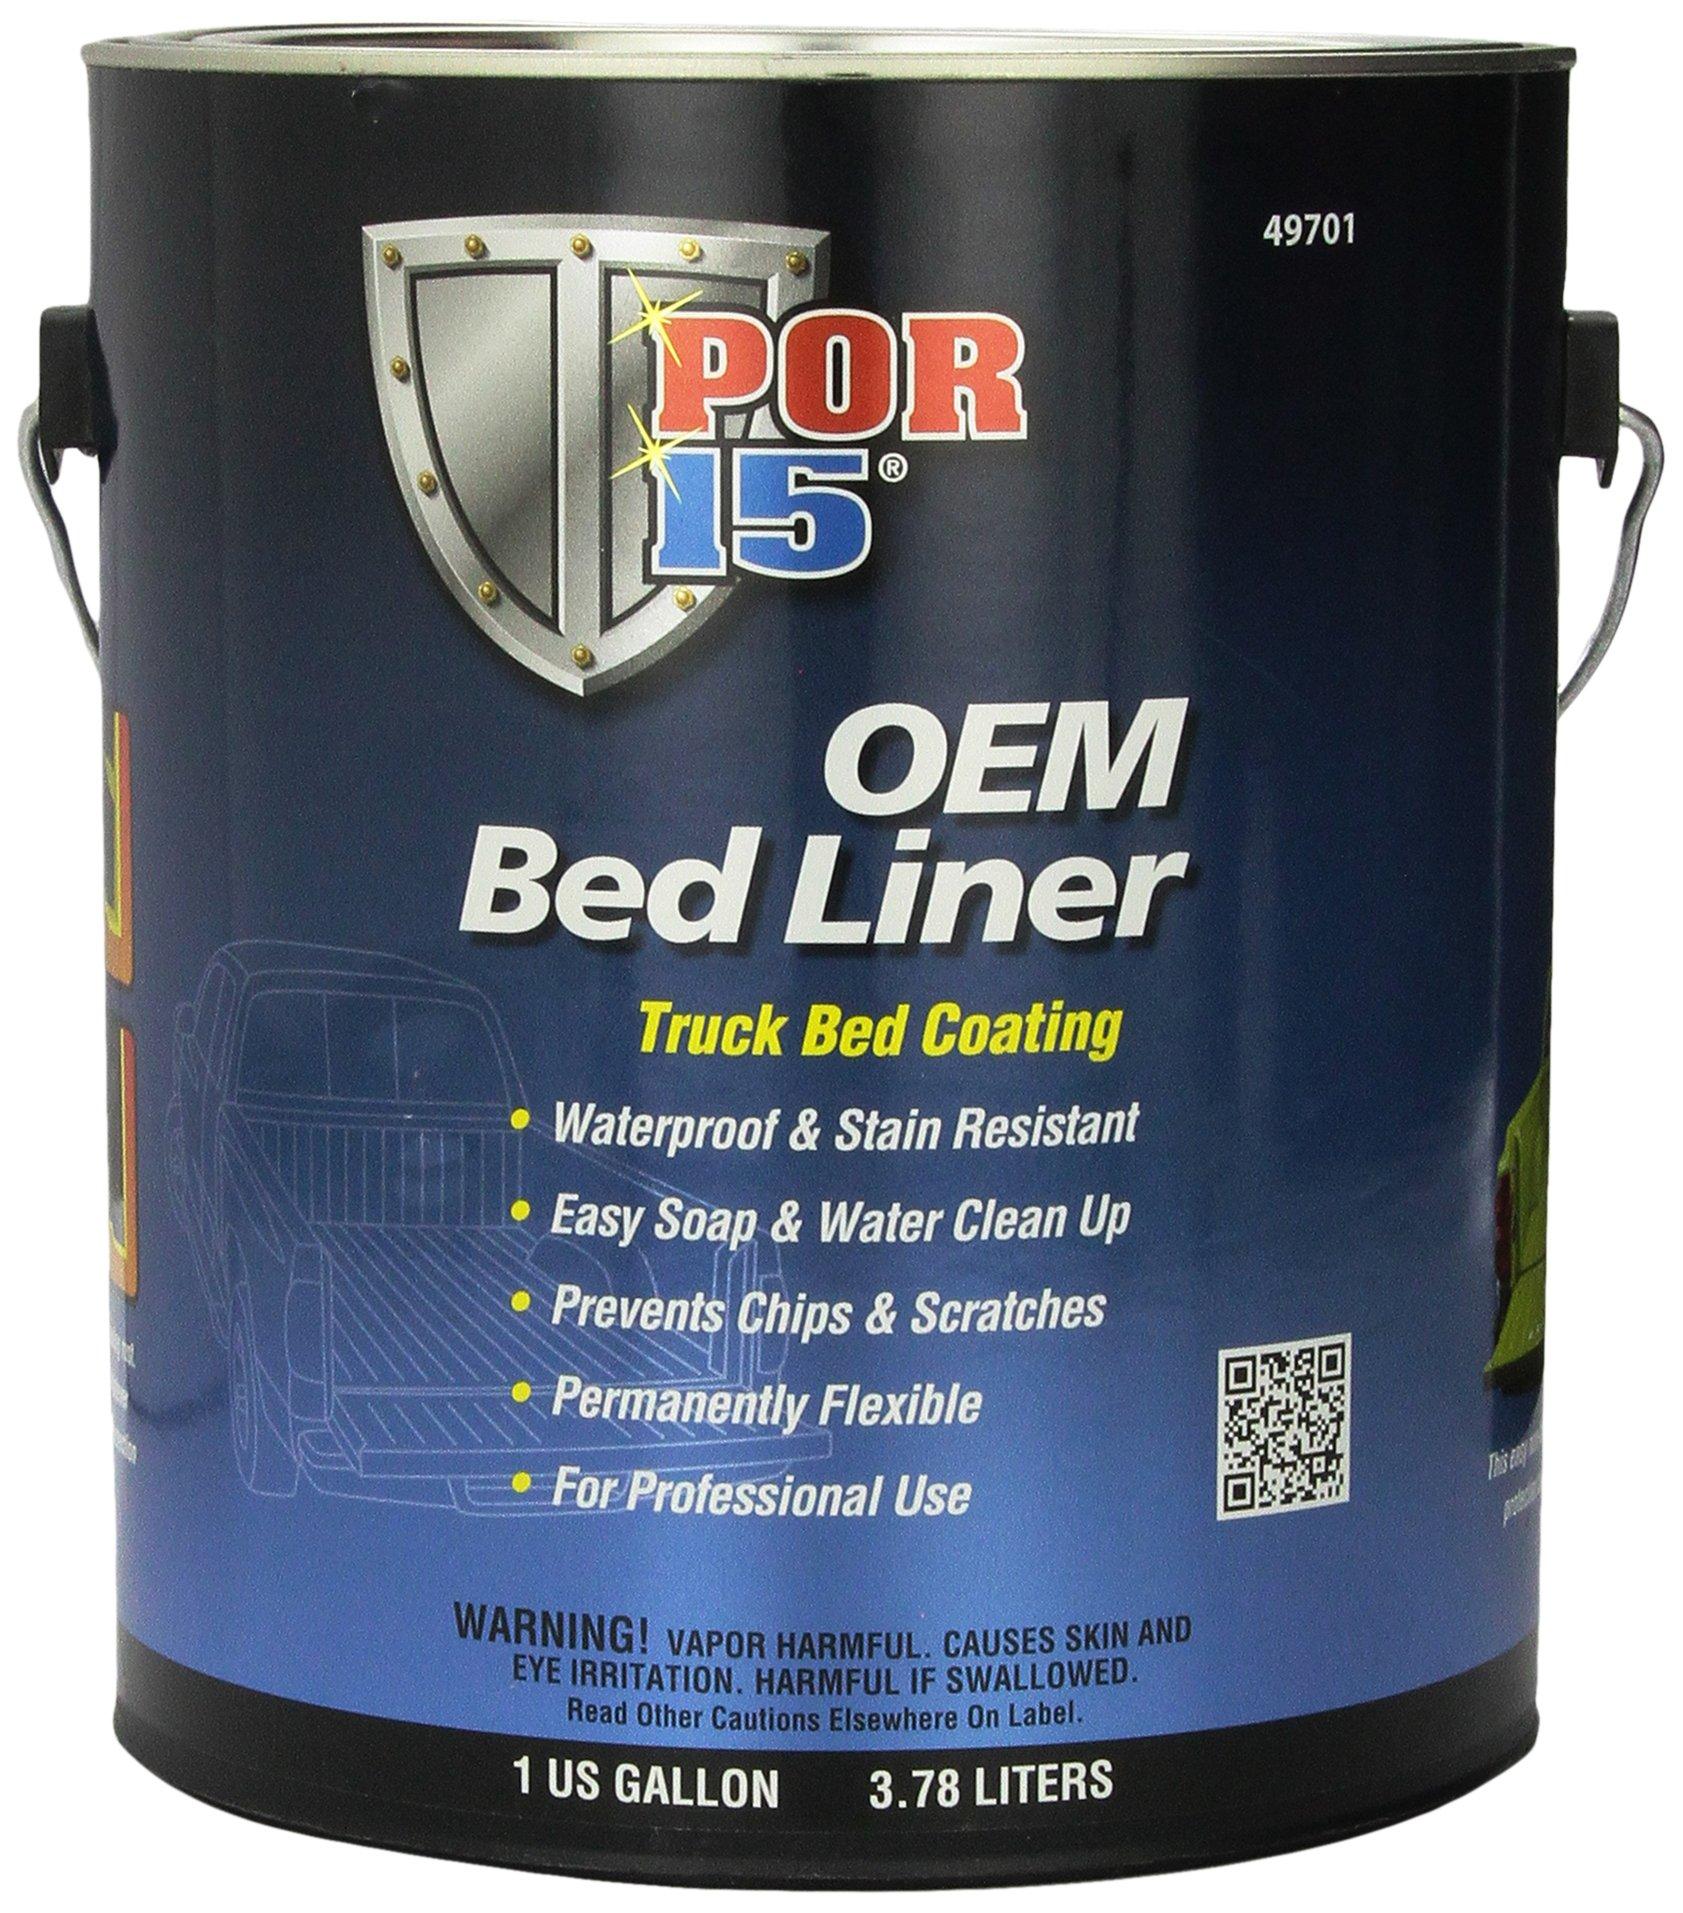 POR-15 49701 OEM Bed Liner - 1 gal by POR-15